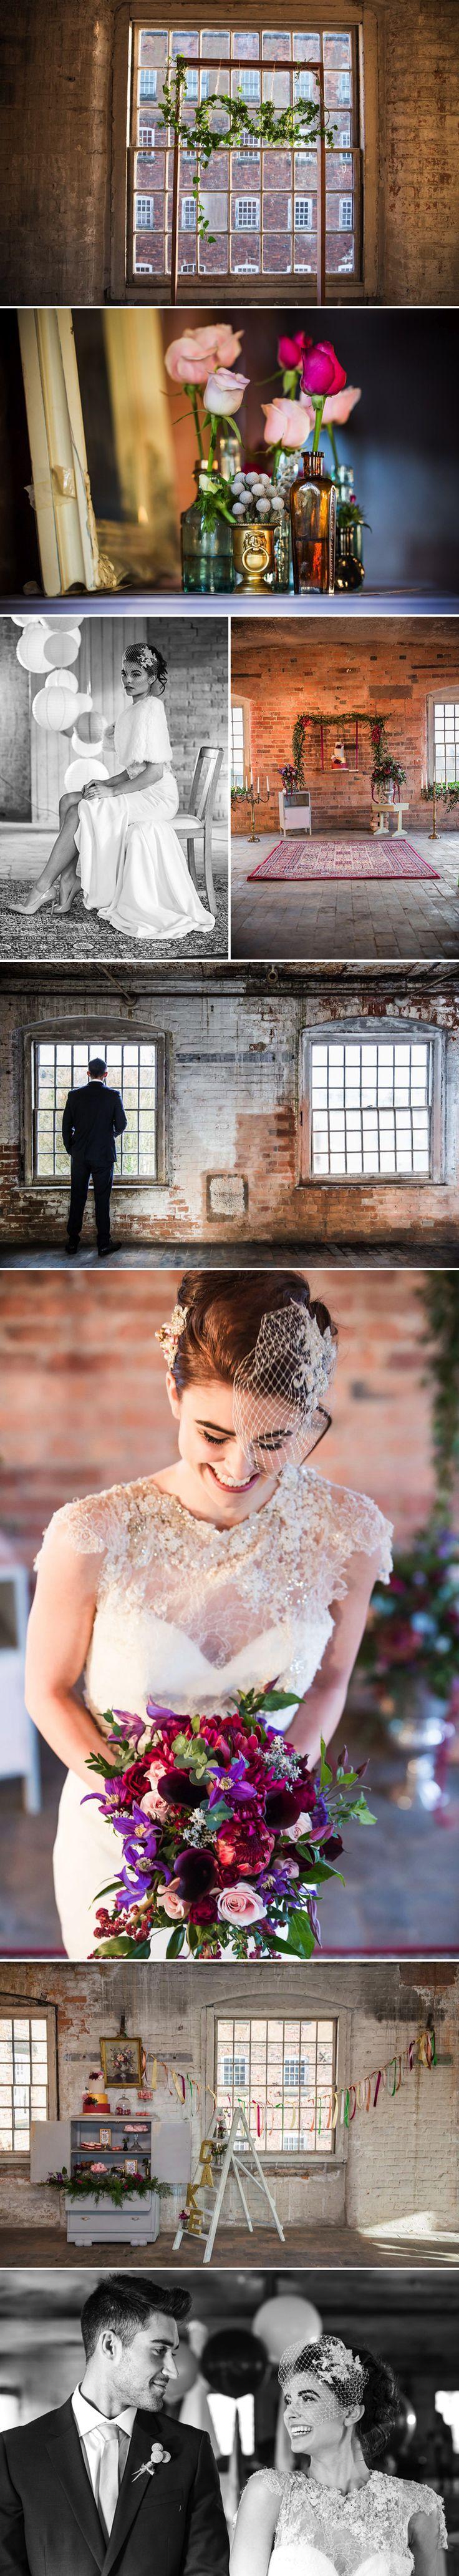 derby-wedding-venue-the-west-mill-industrial-wedding-venue-coco-wedding-venues-002